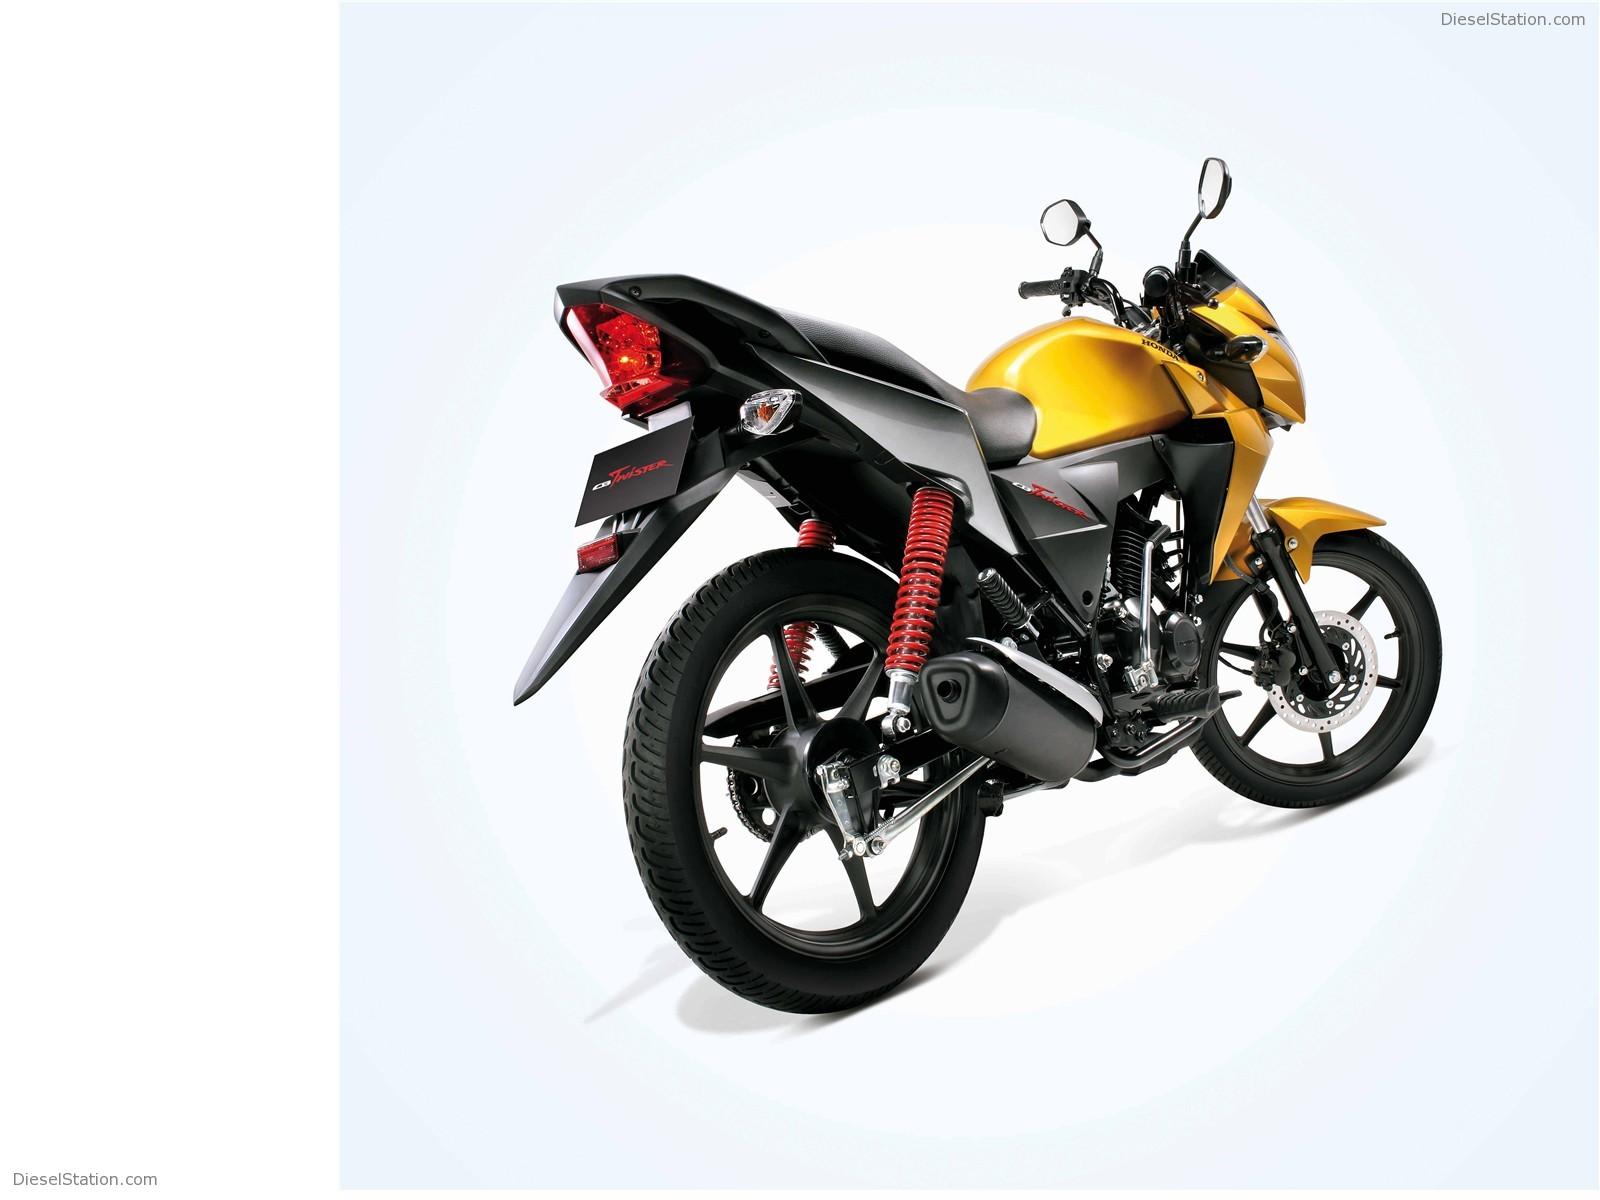 Honda Cb Twister - Honda Cb Twister Bike , HD Wallpaper & Backgrounds